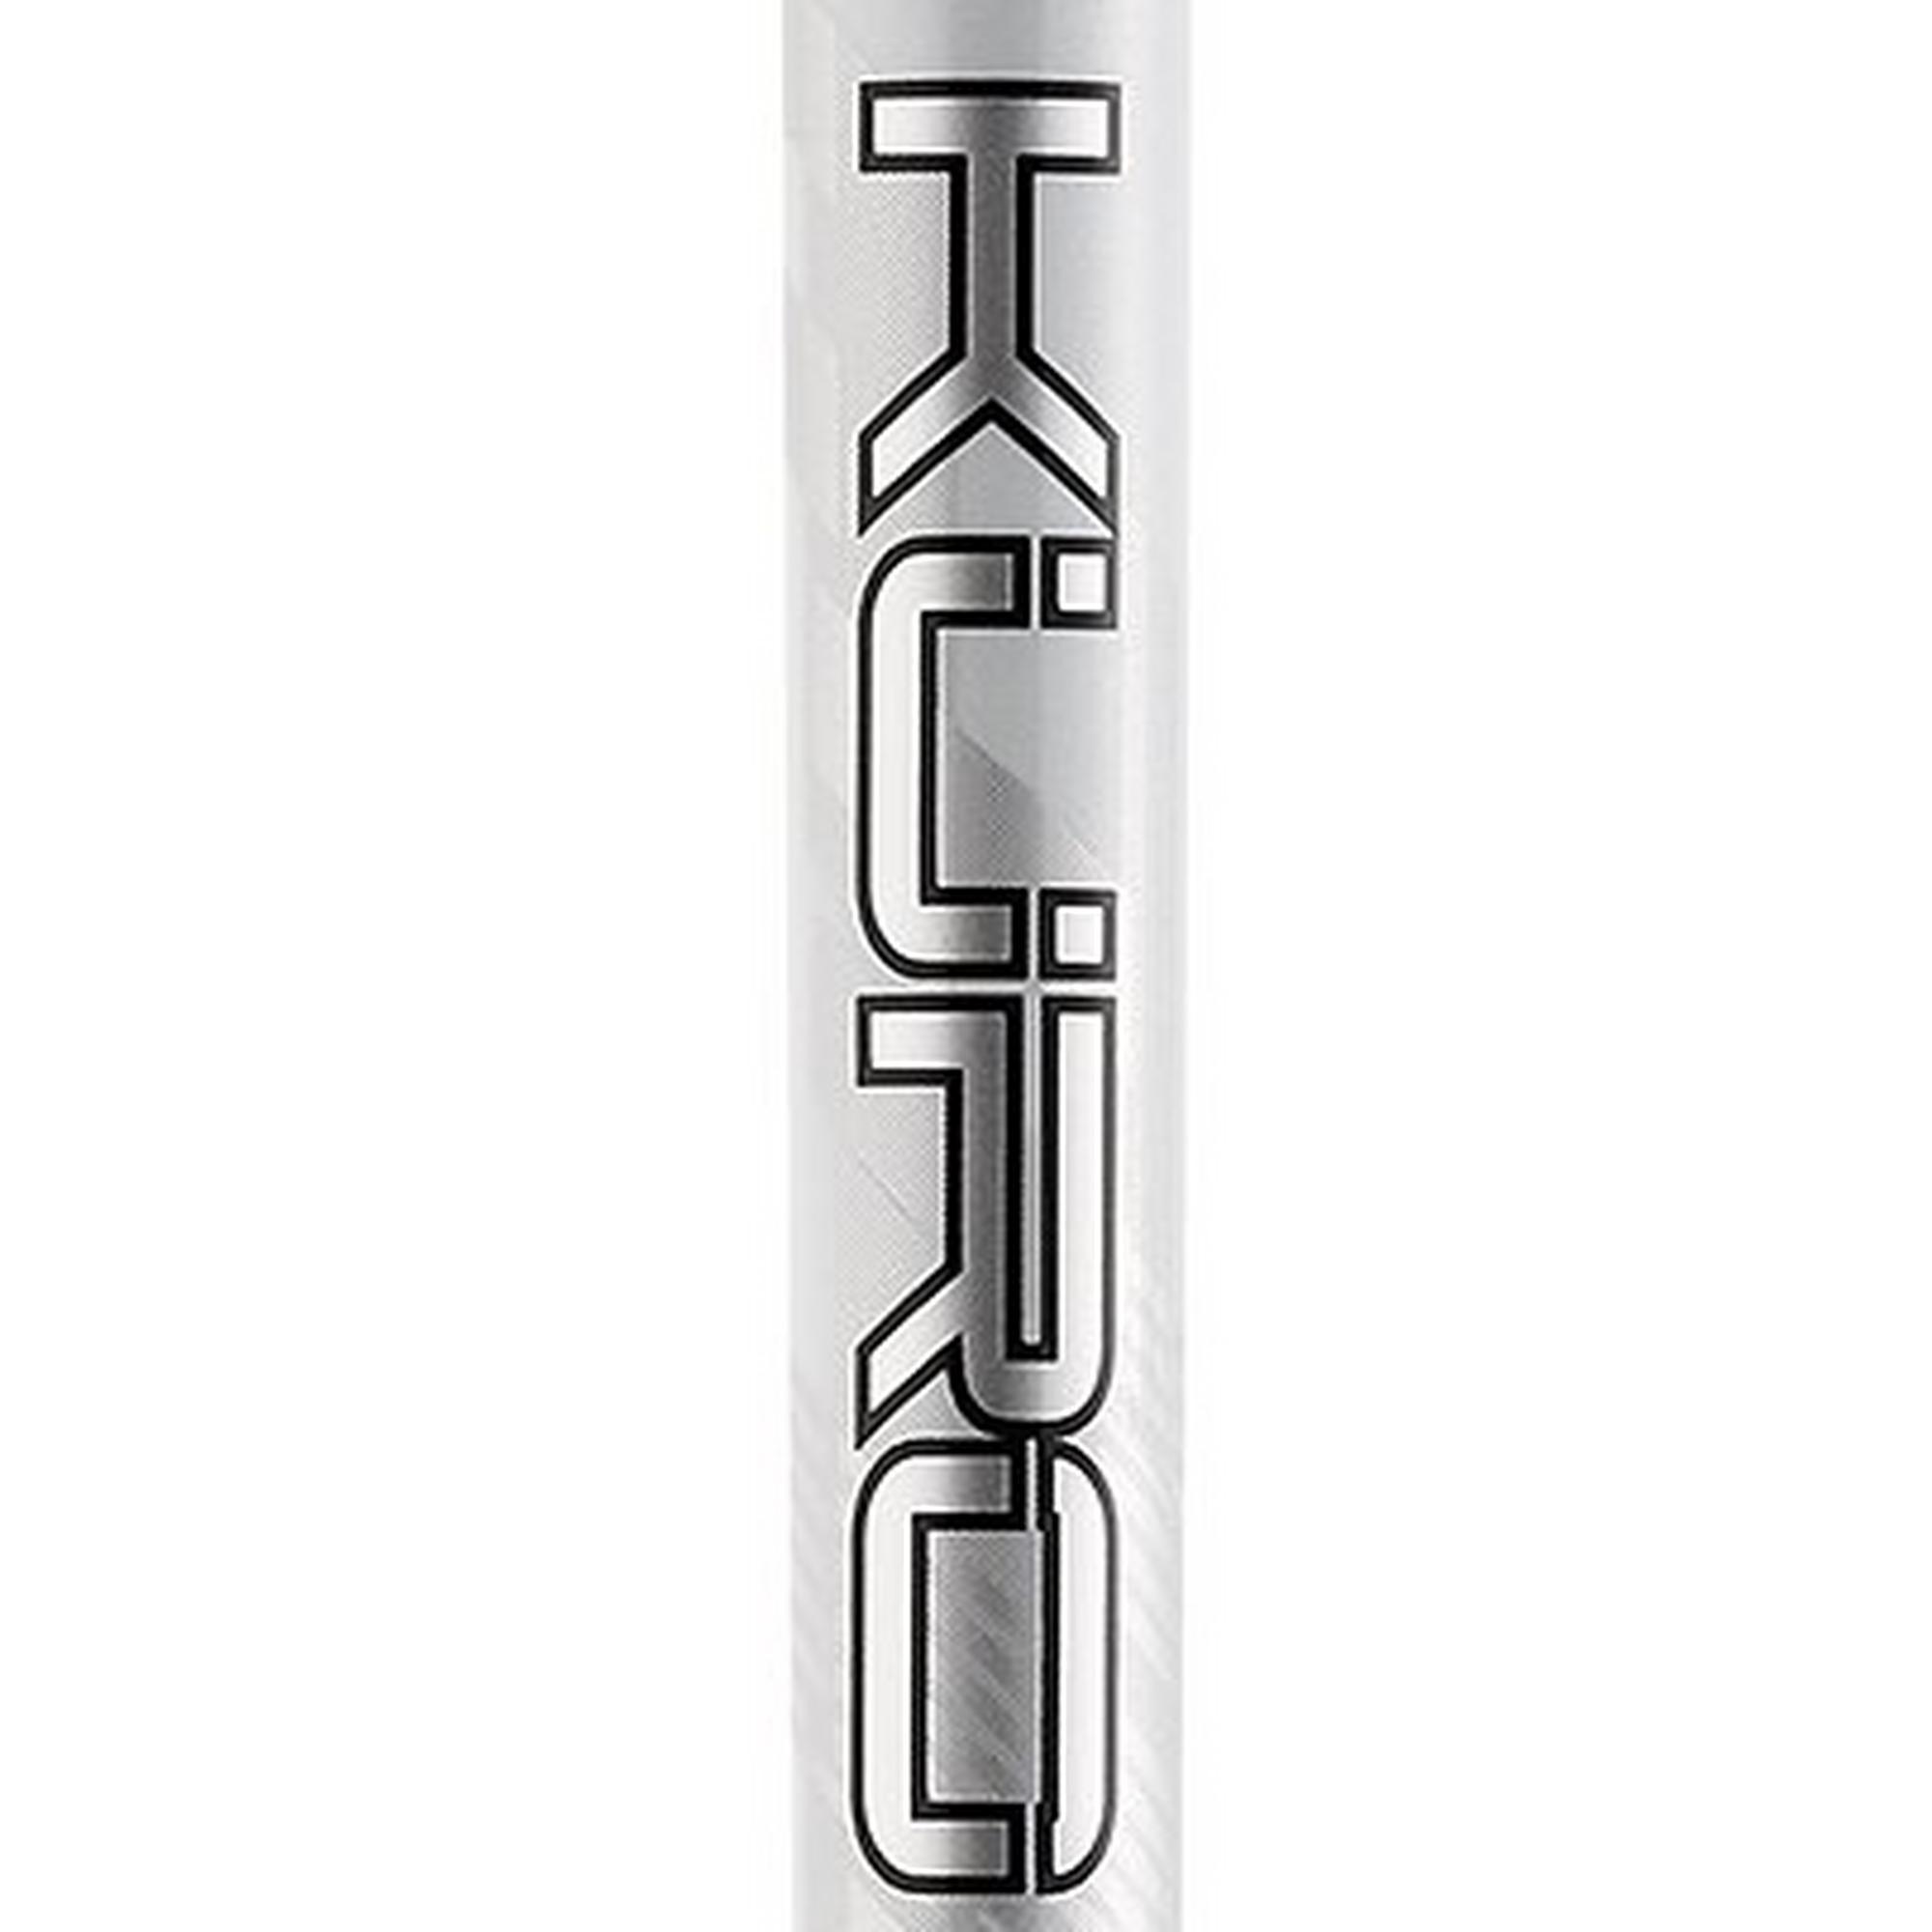 Kuro Kage Silver with TiNi 60 .335 Graphite Wood Shaft